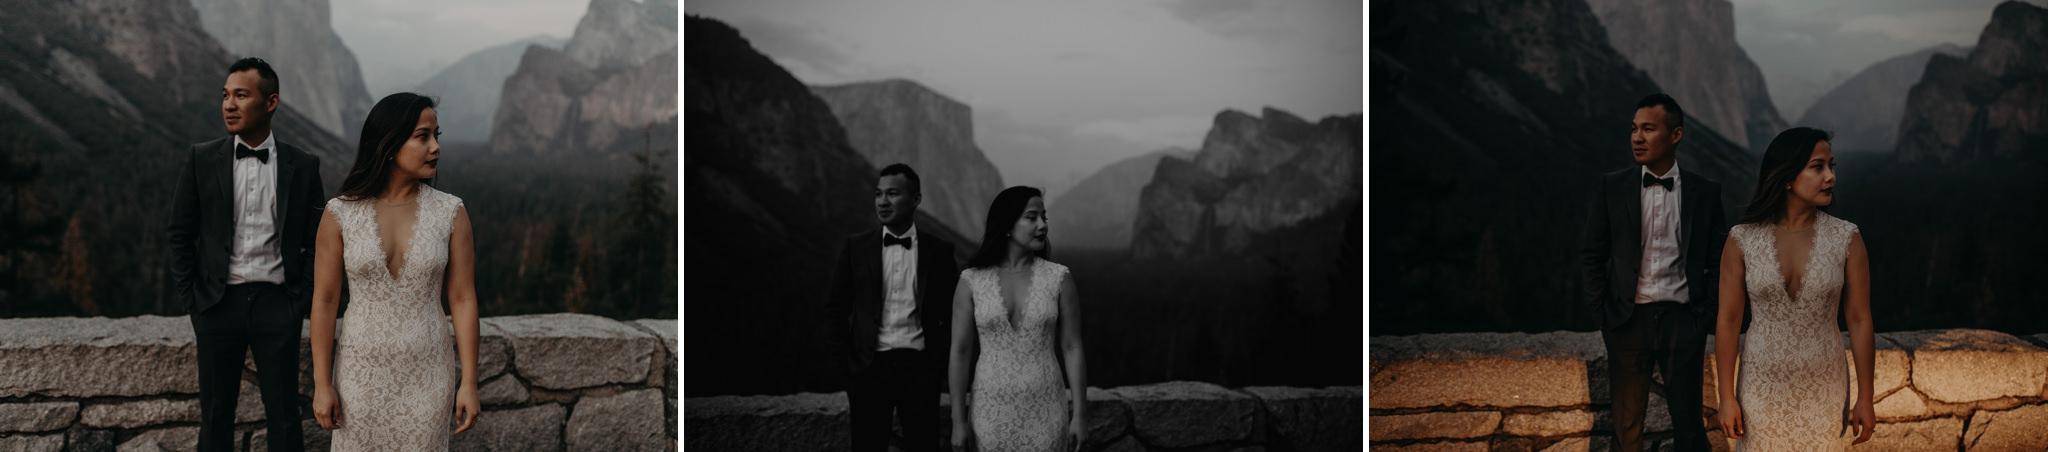 Yosemite-Wedding-Photographer14.jpg